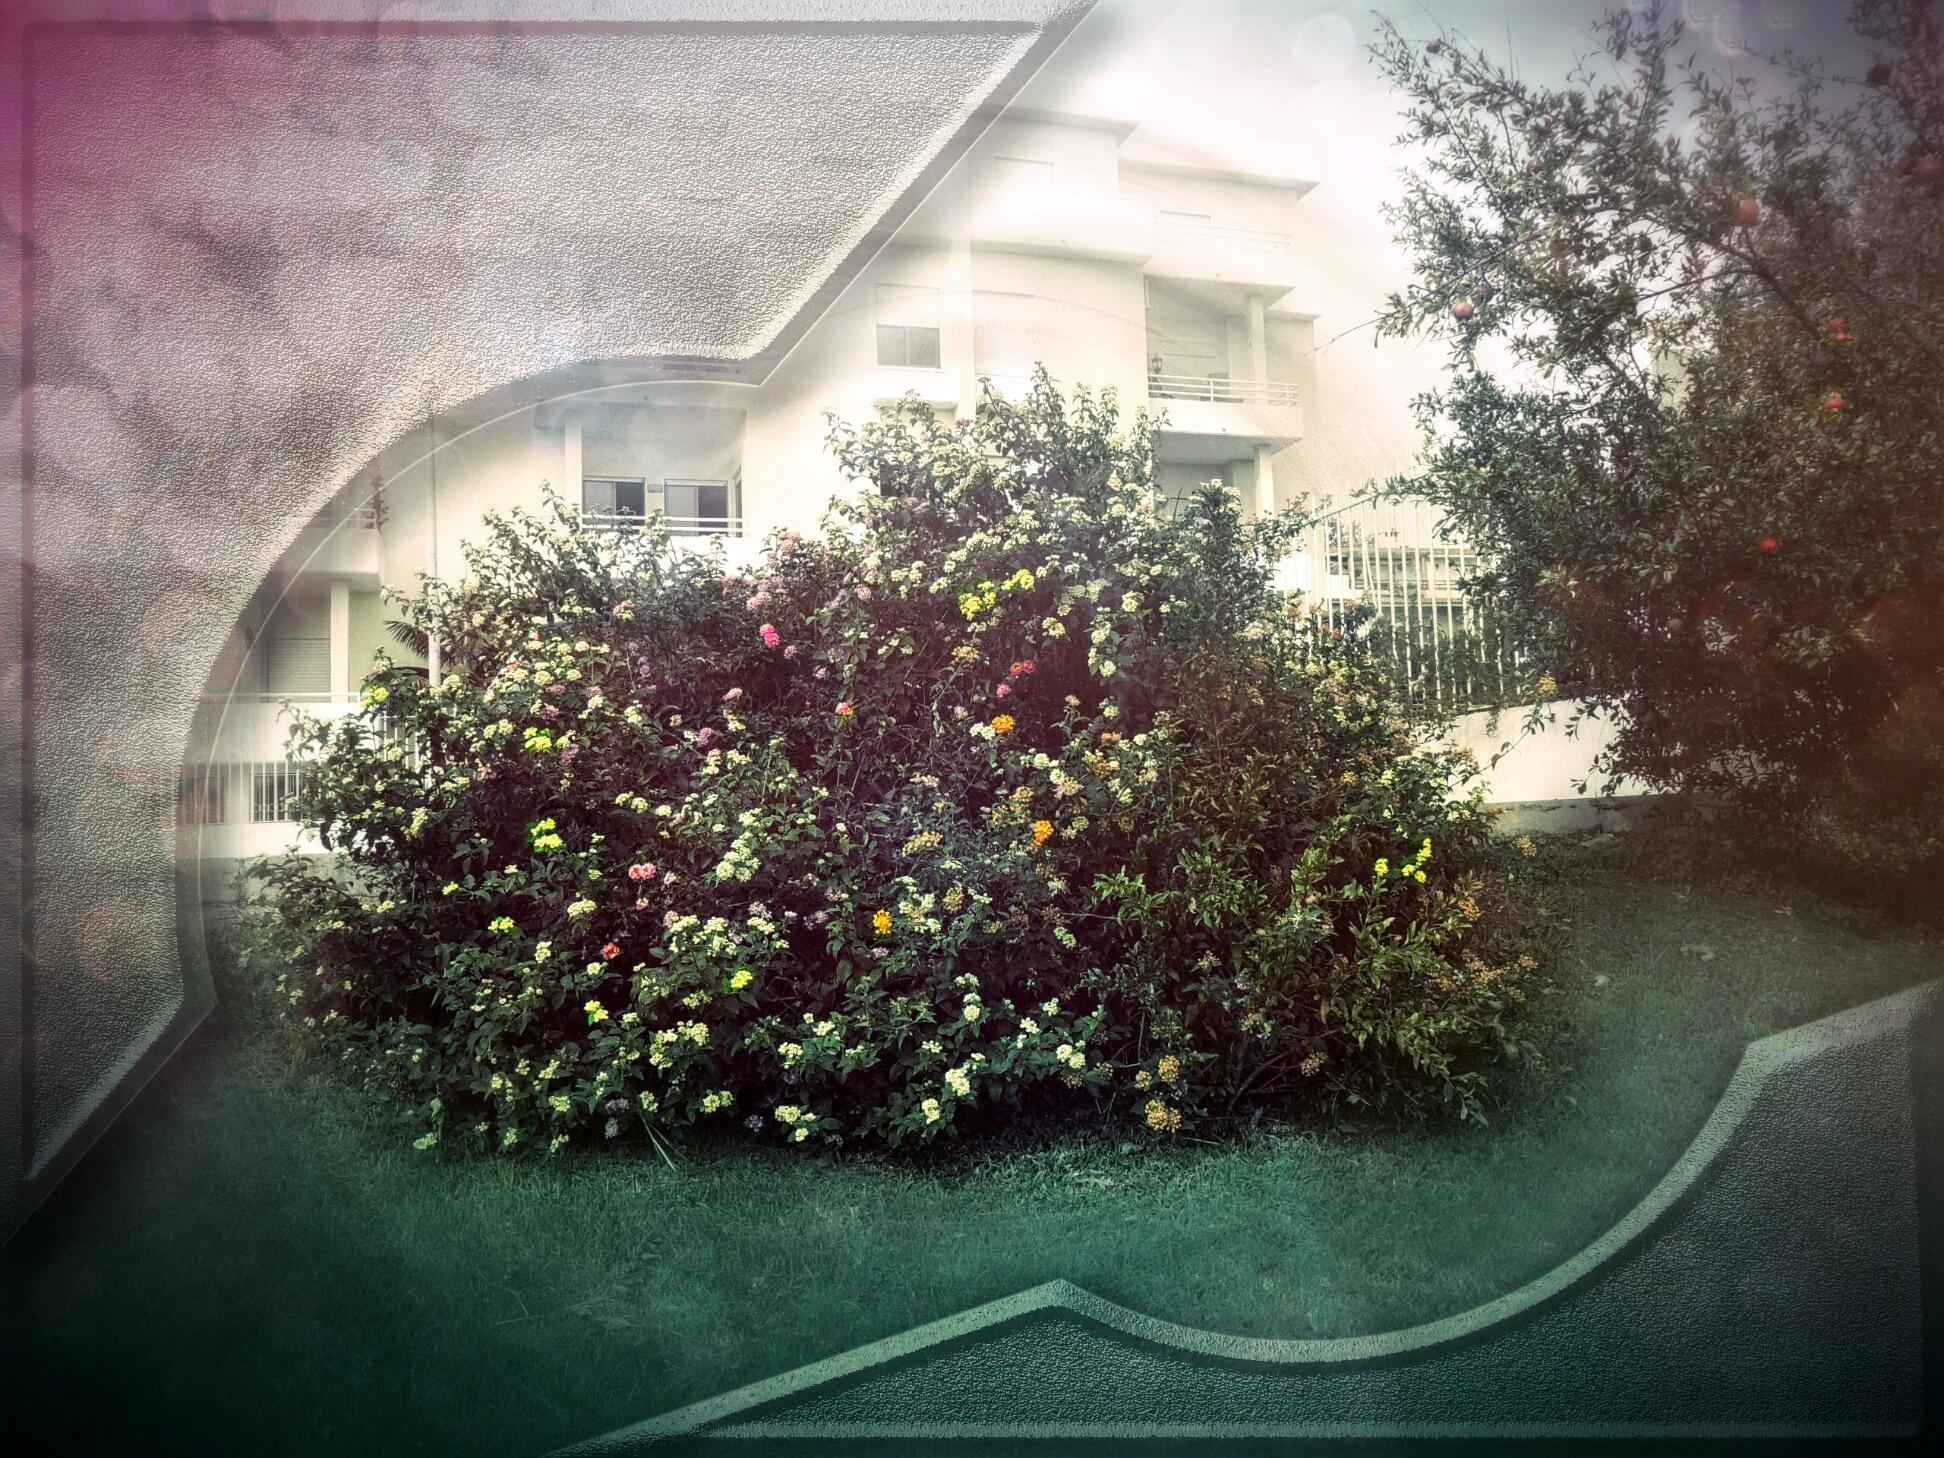 Garden,flowers by Bruno Miguel Sousa (Pr0m4xine)